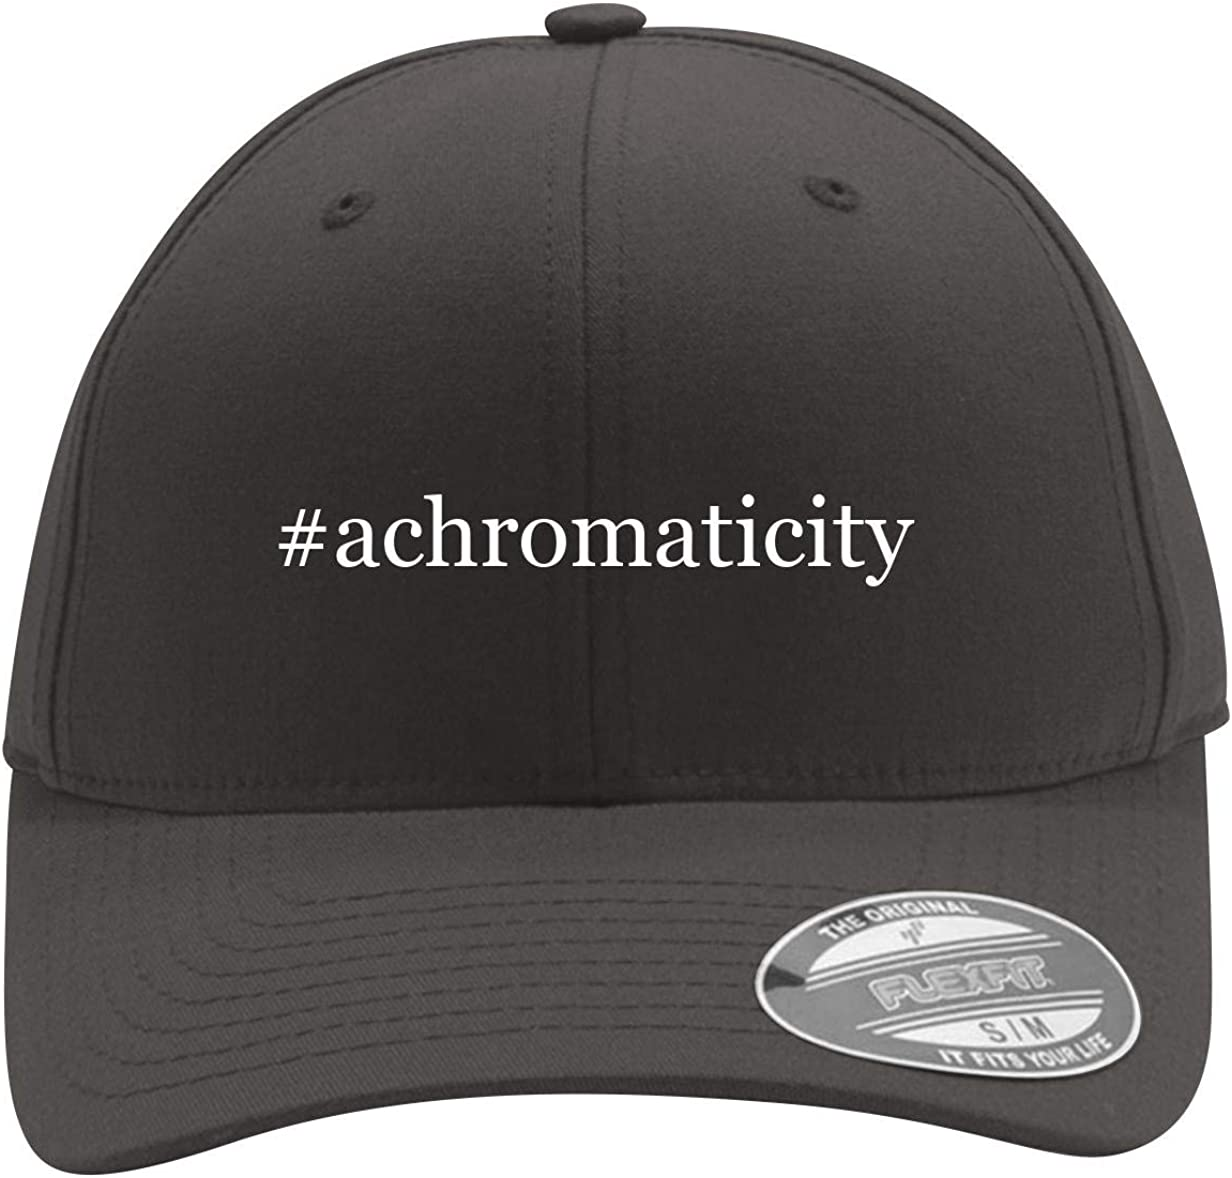 #Achromaticity - Men's Hashtag Flexfit Baseball Cap Hat 61hti3aov6L